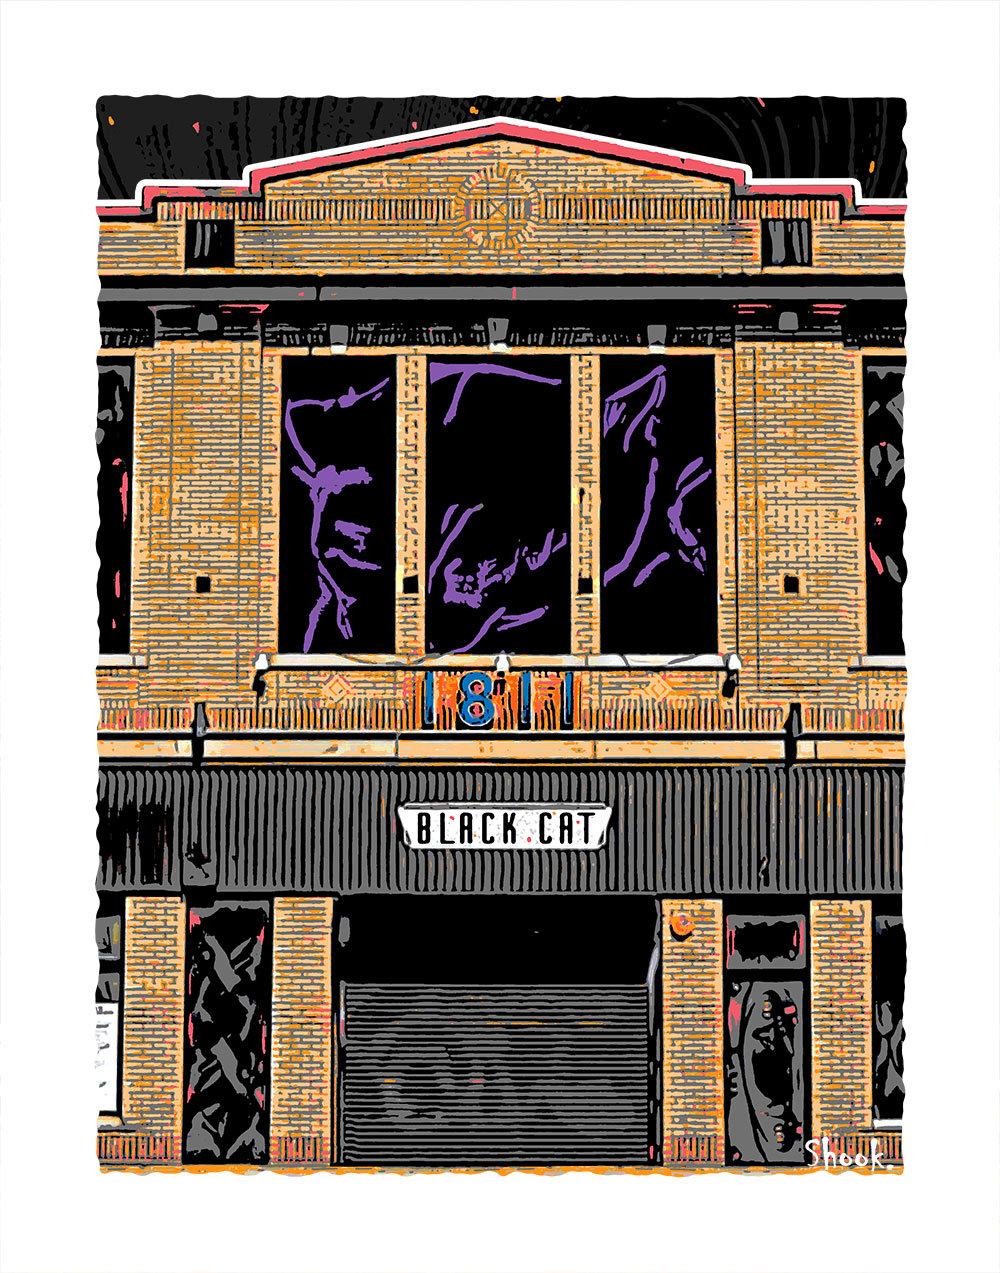 Black Cat DC Giclée Art Print (Multi-size options)